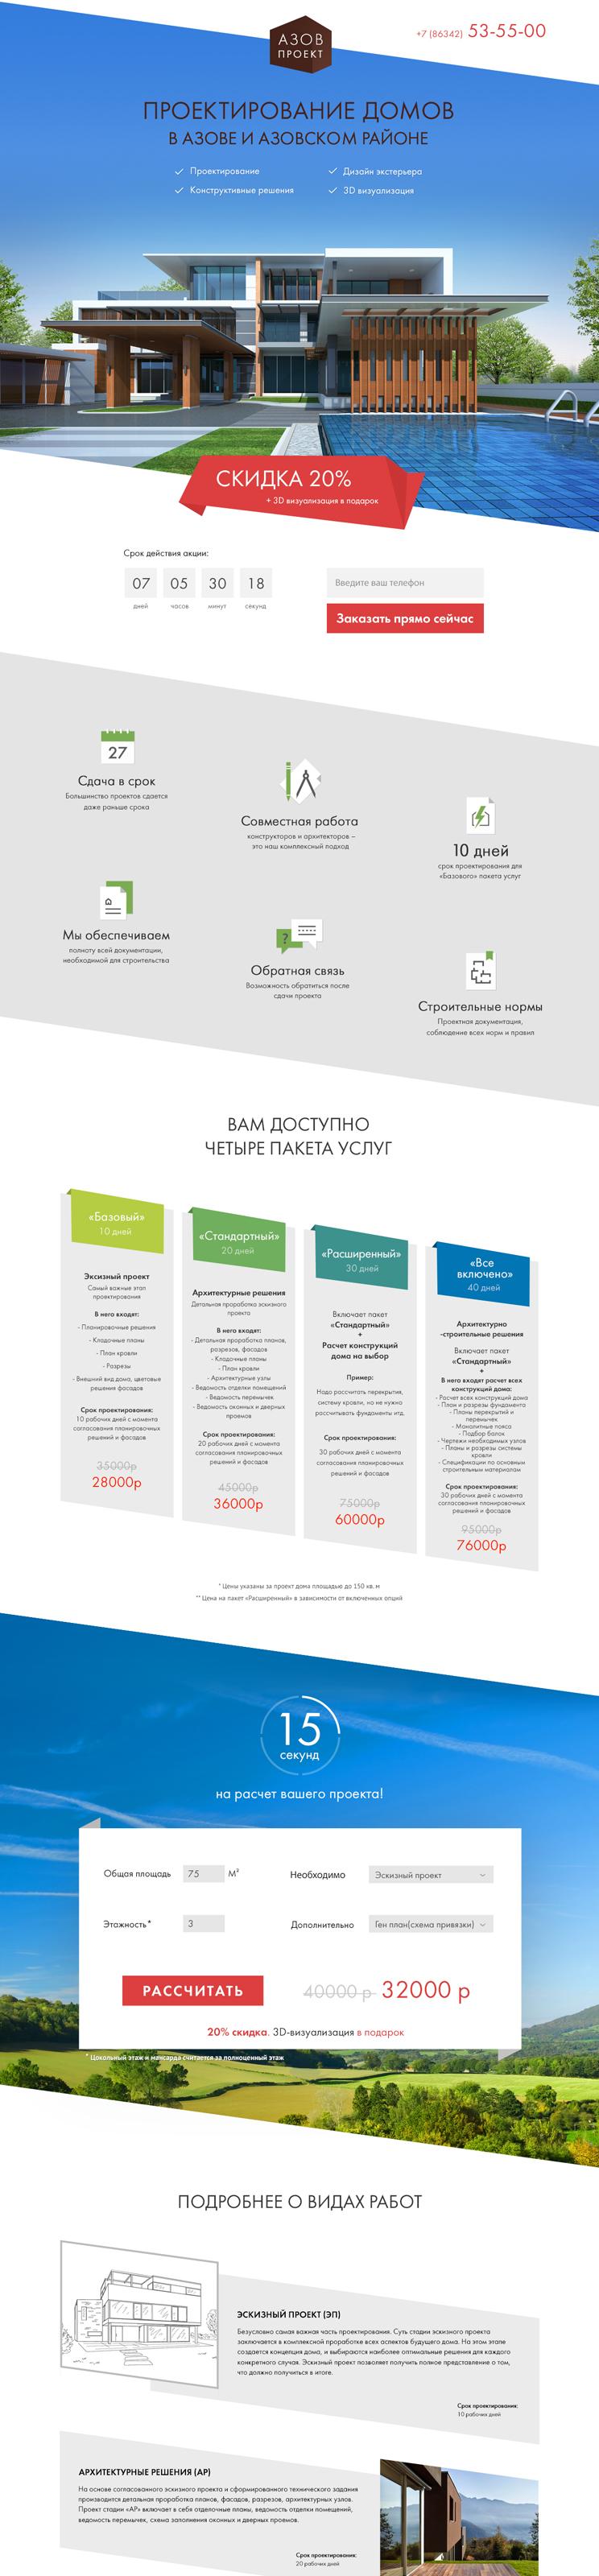 Landing page для Азов-проект